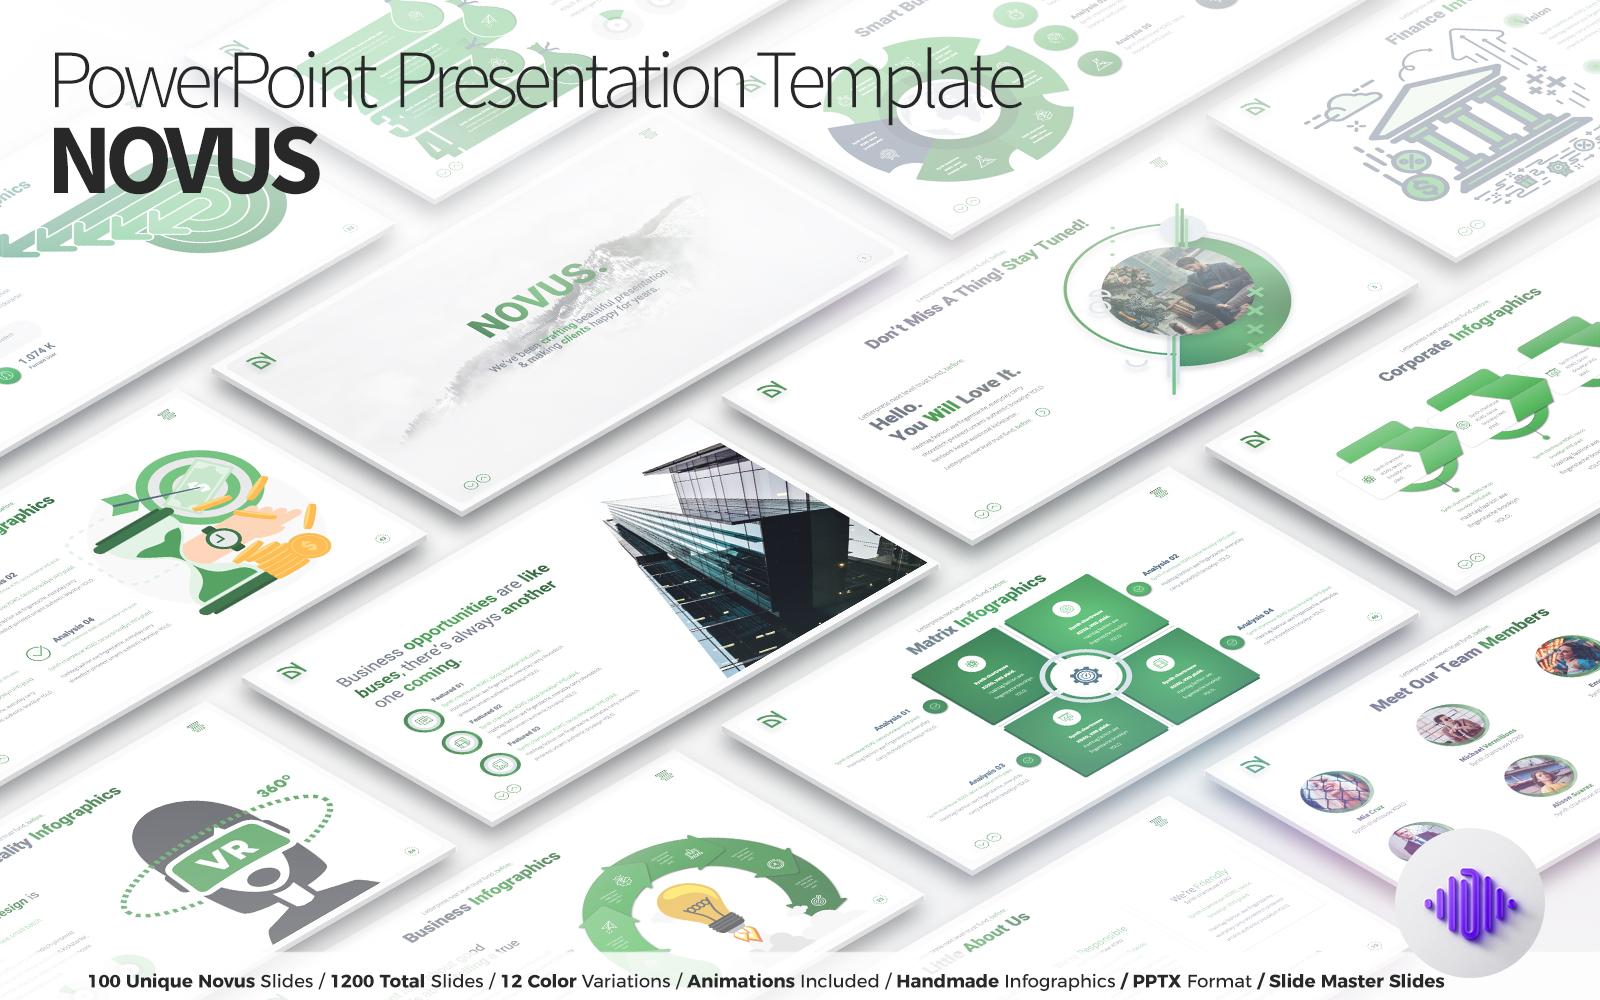 NOVUS - PowerPoint Presentation Template